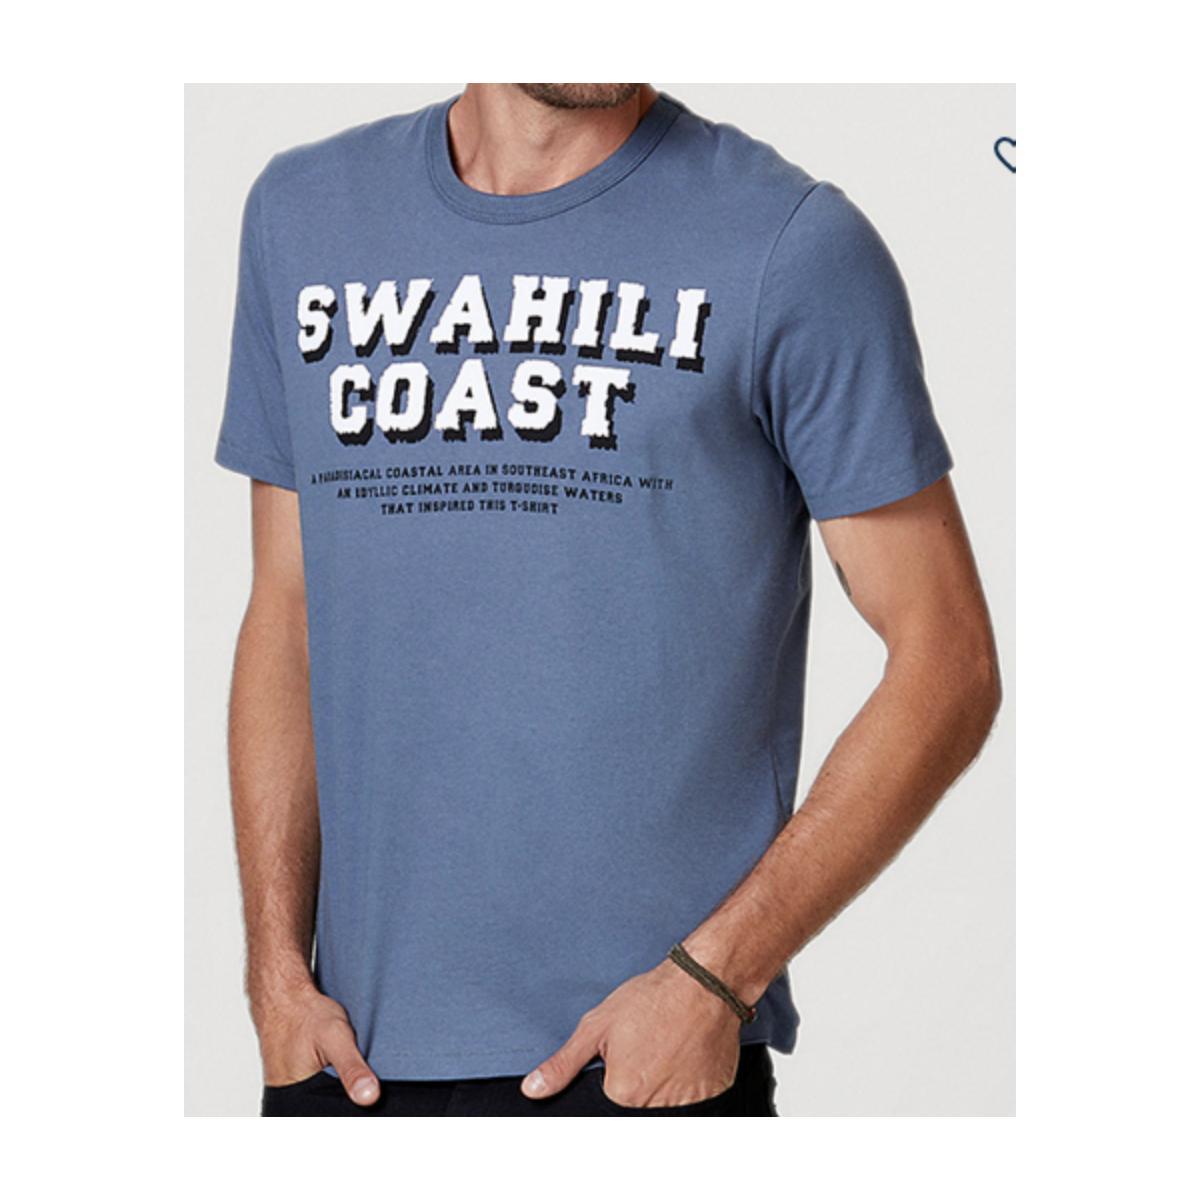 Camiseta Masculina Hering 4eeq Av2en Azul